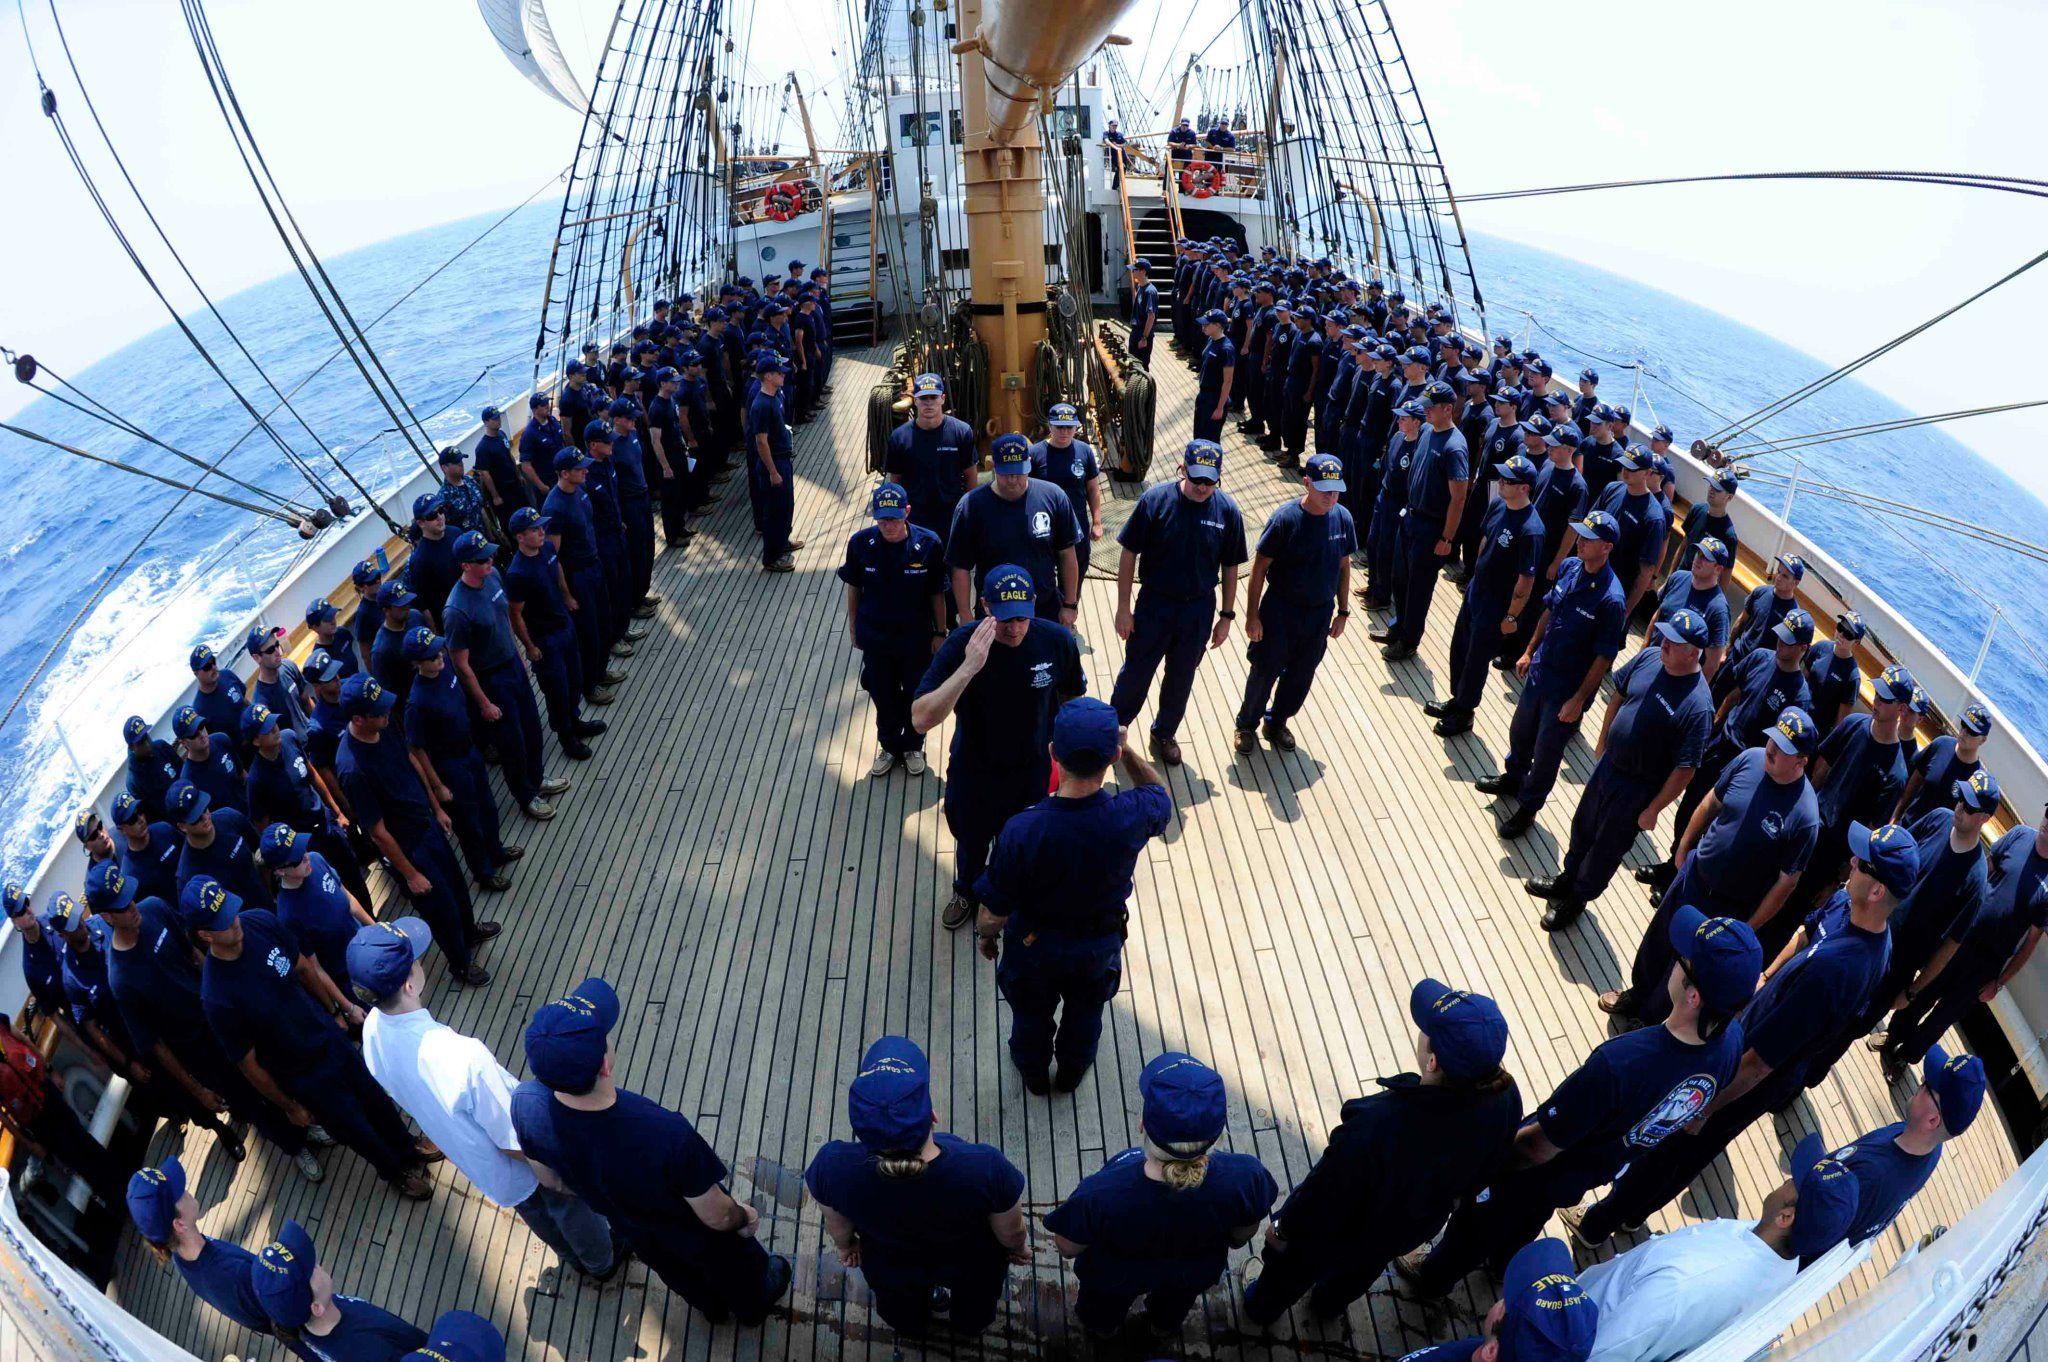 All hands muster coast guard cutter coast guard eagle